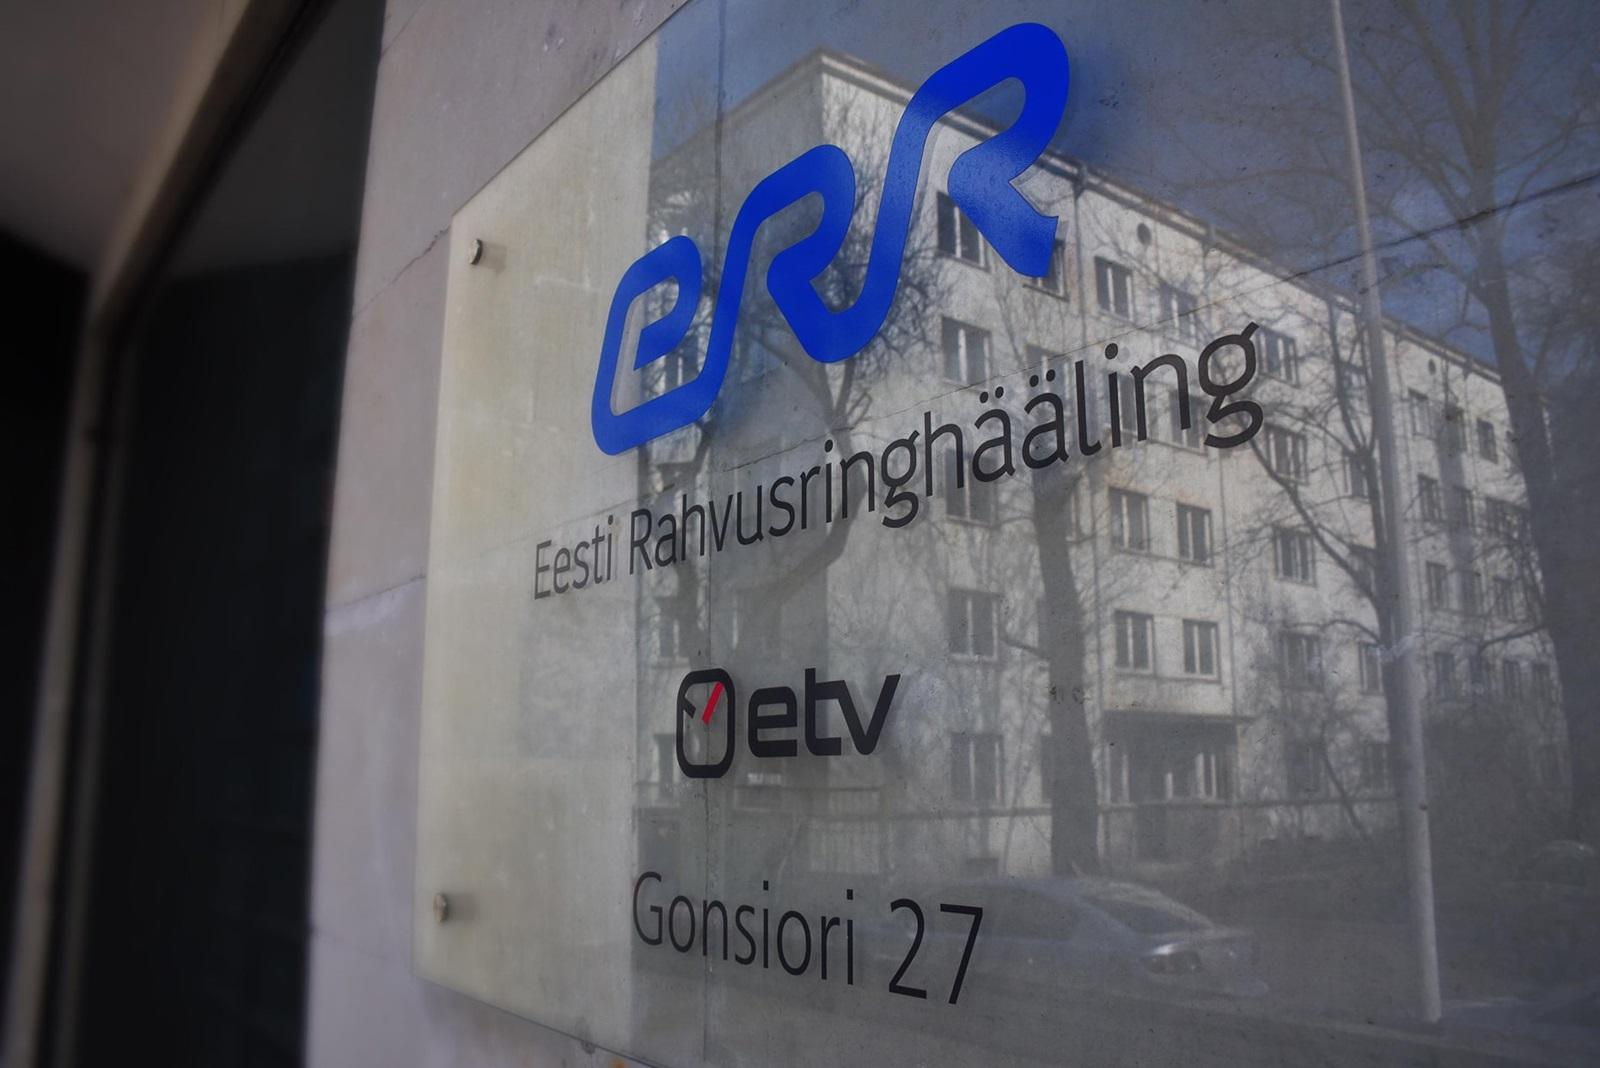 Estonian Public Broadcasting